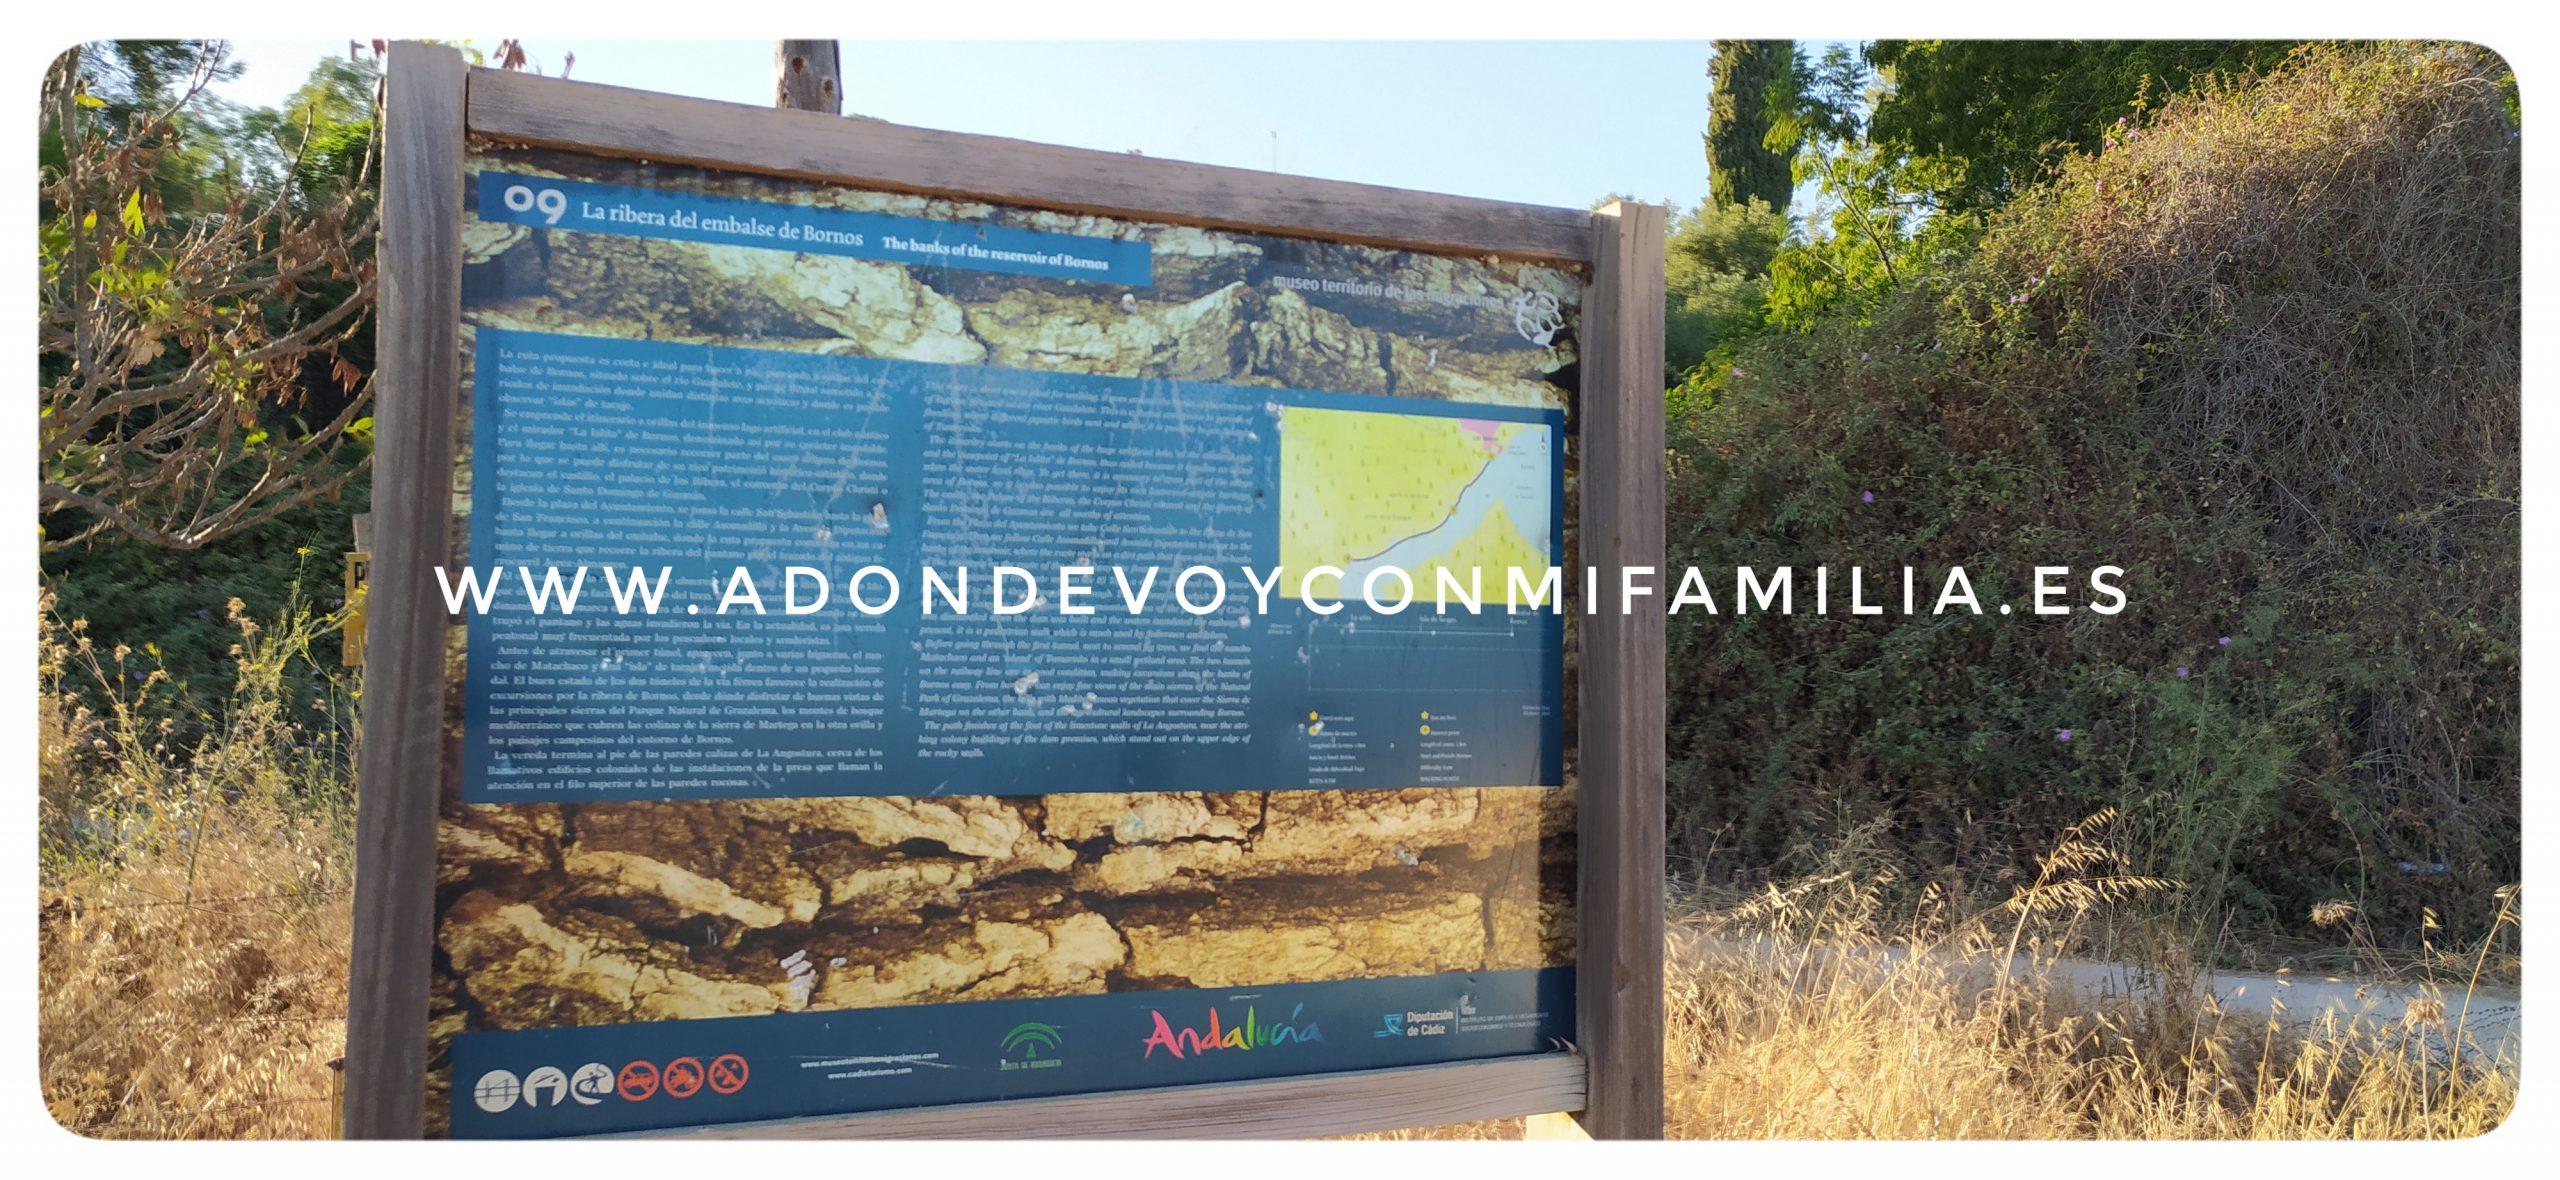 bornos adondevoyconmifamilia (17)